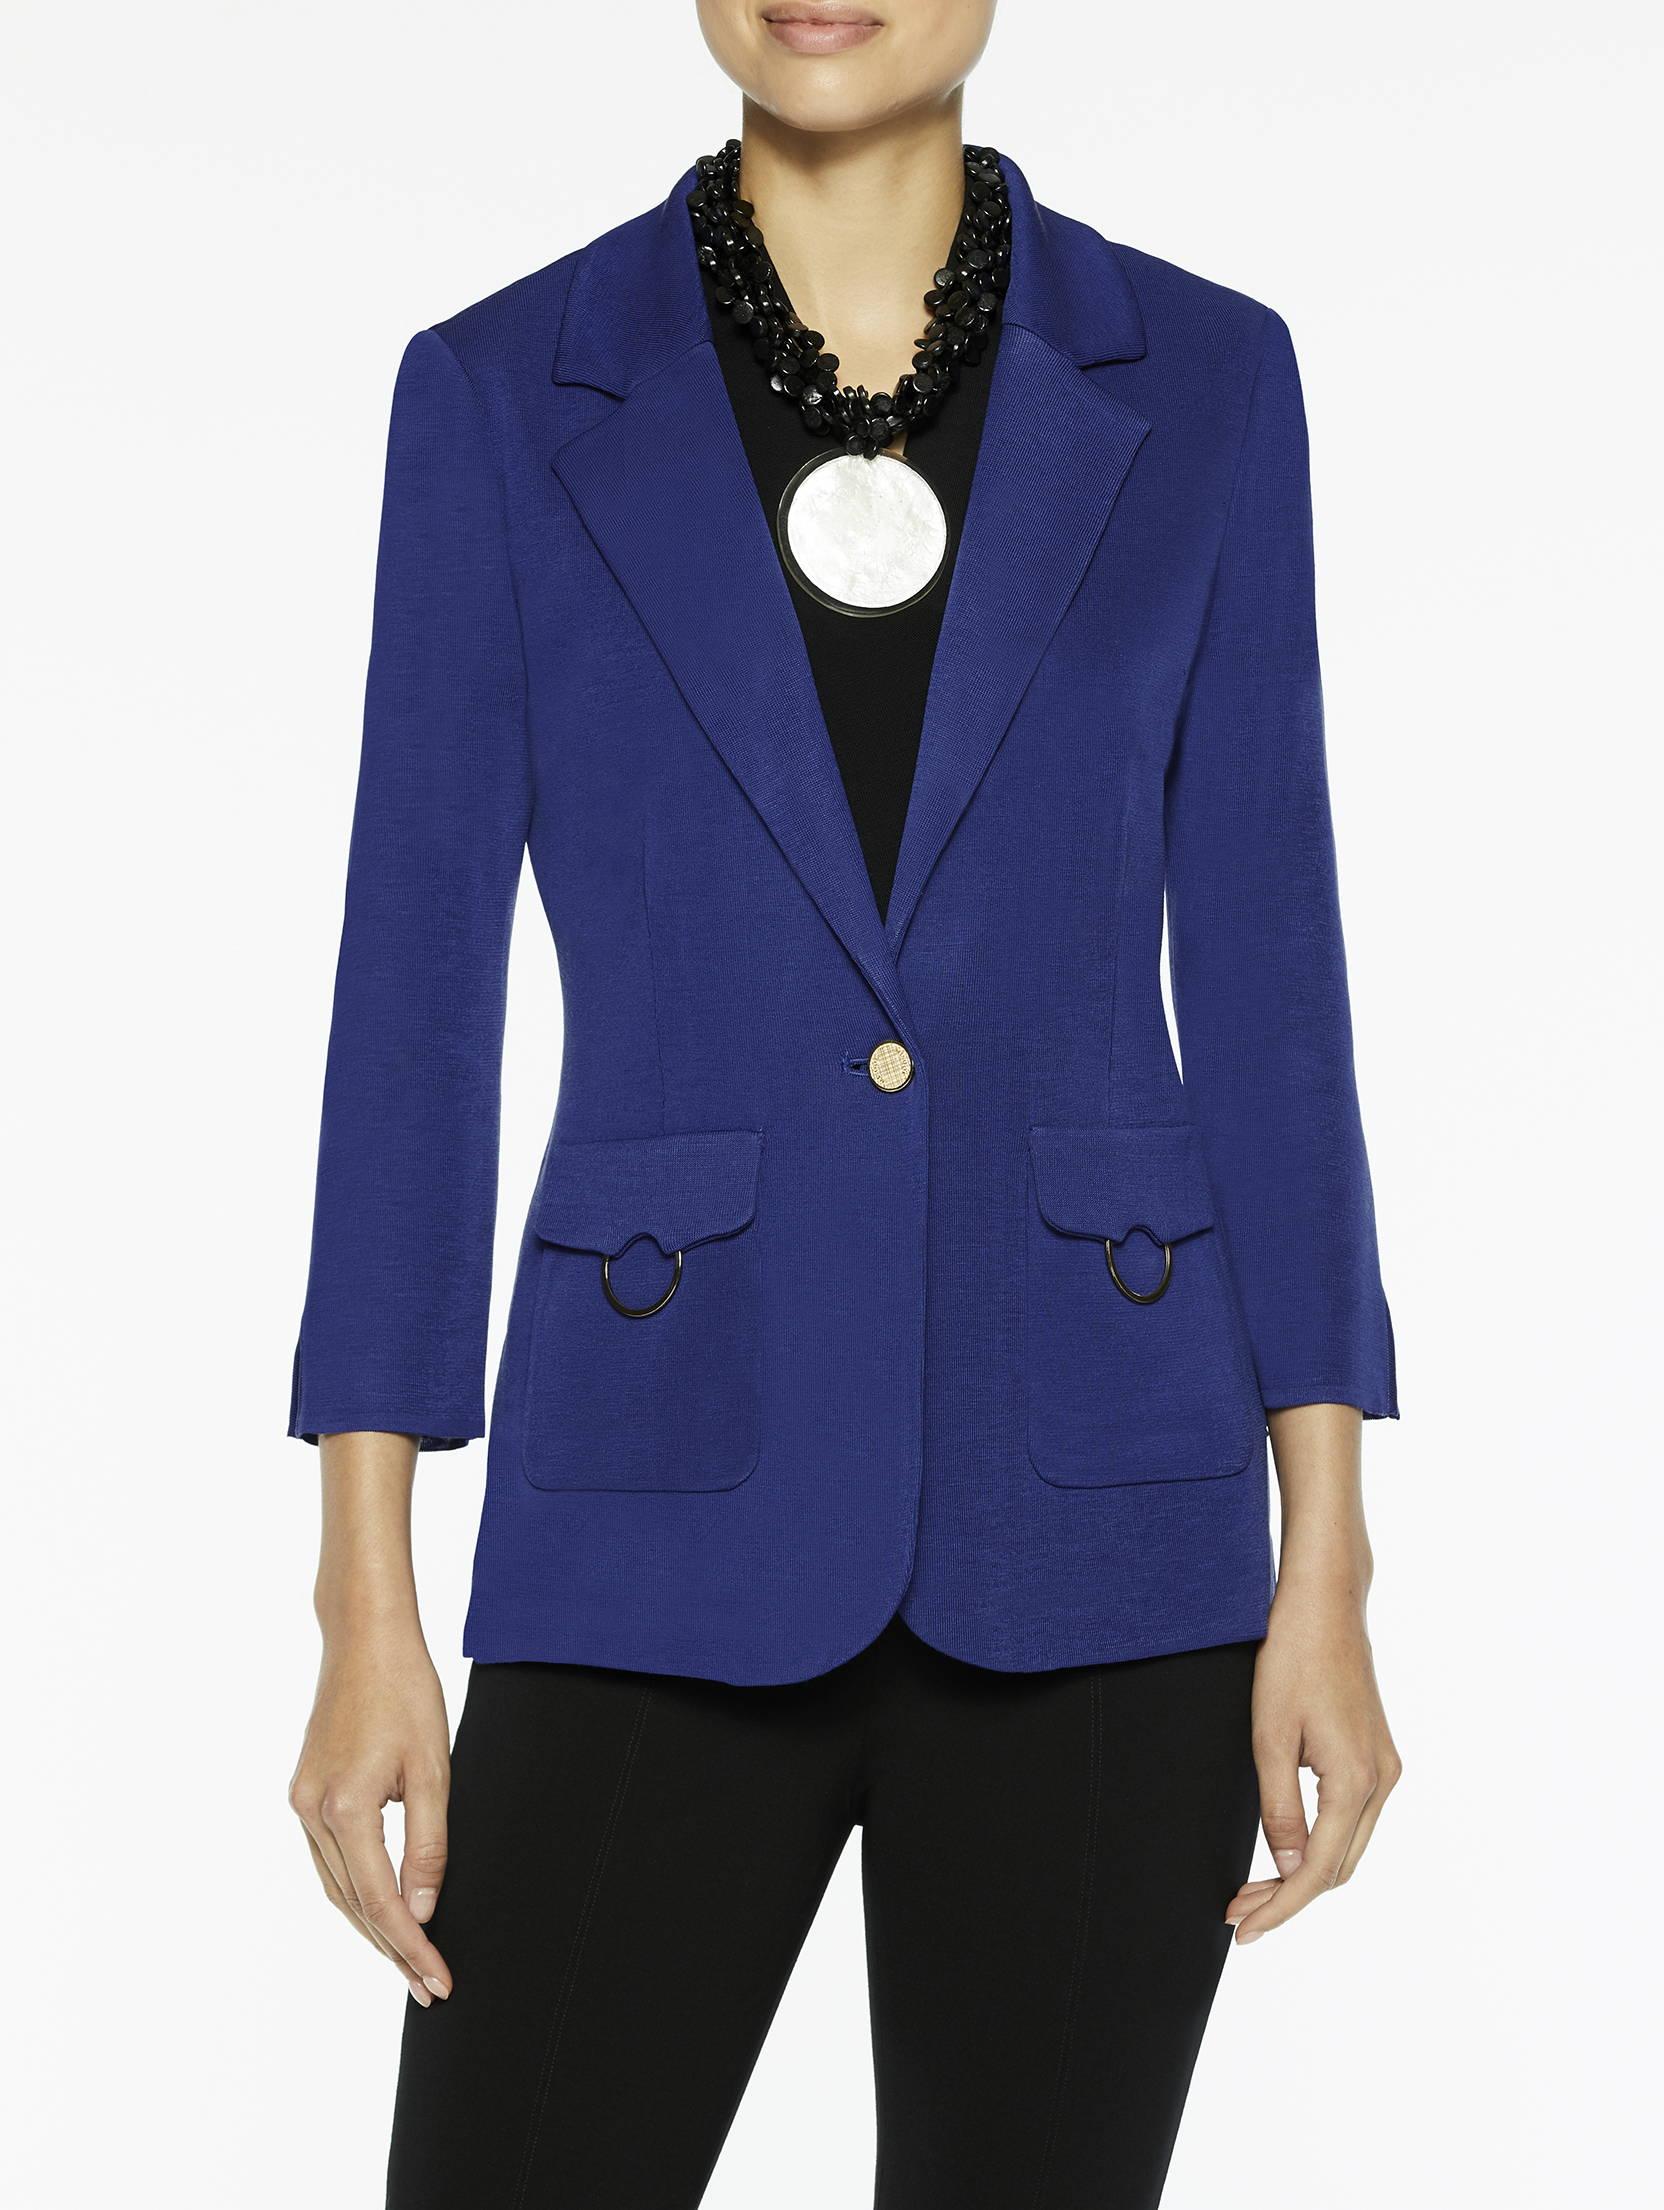 Patch Pocket Knit Jacket in Blue Flame